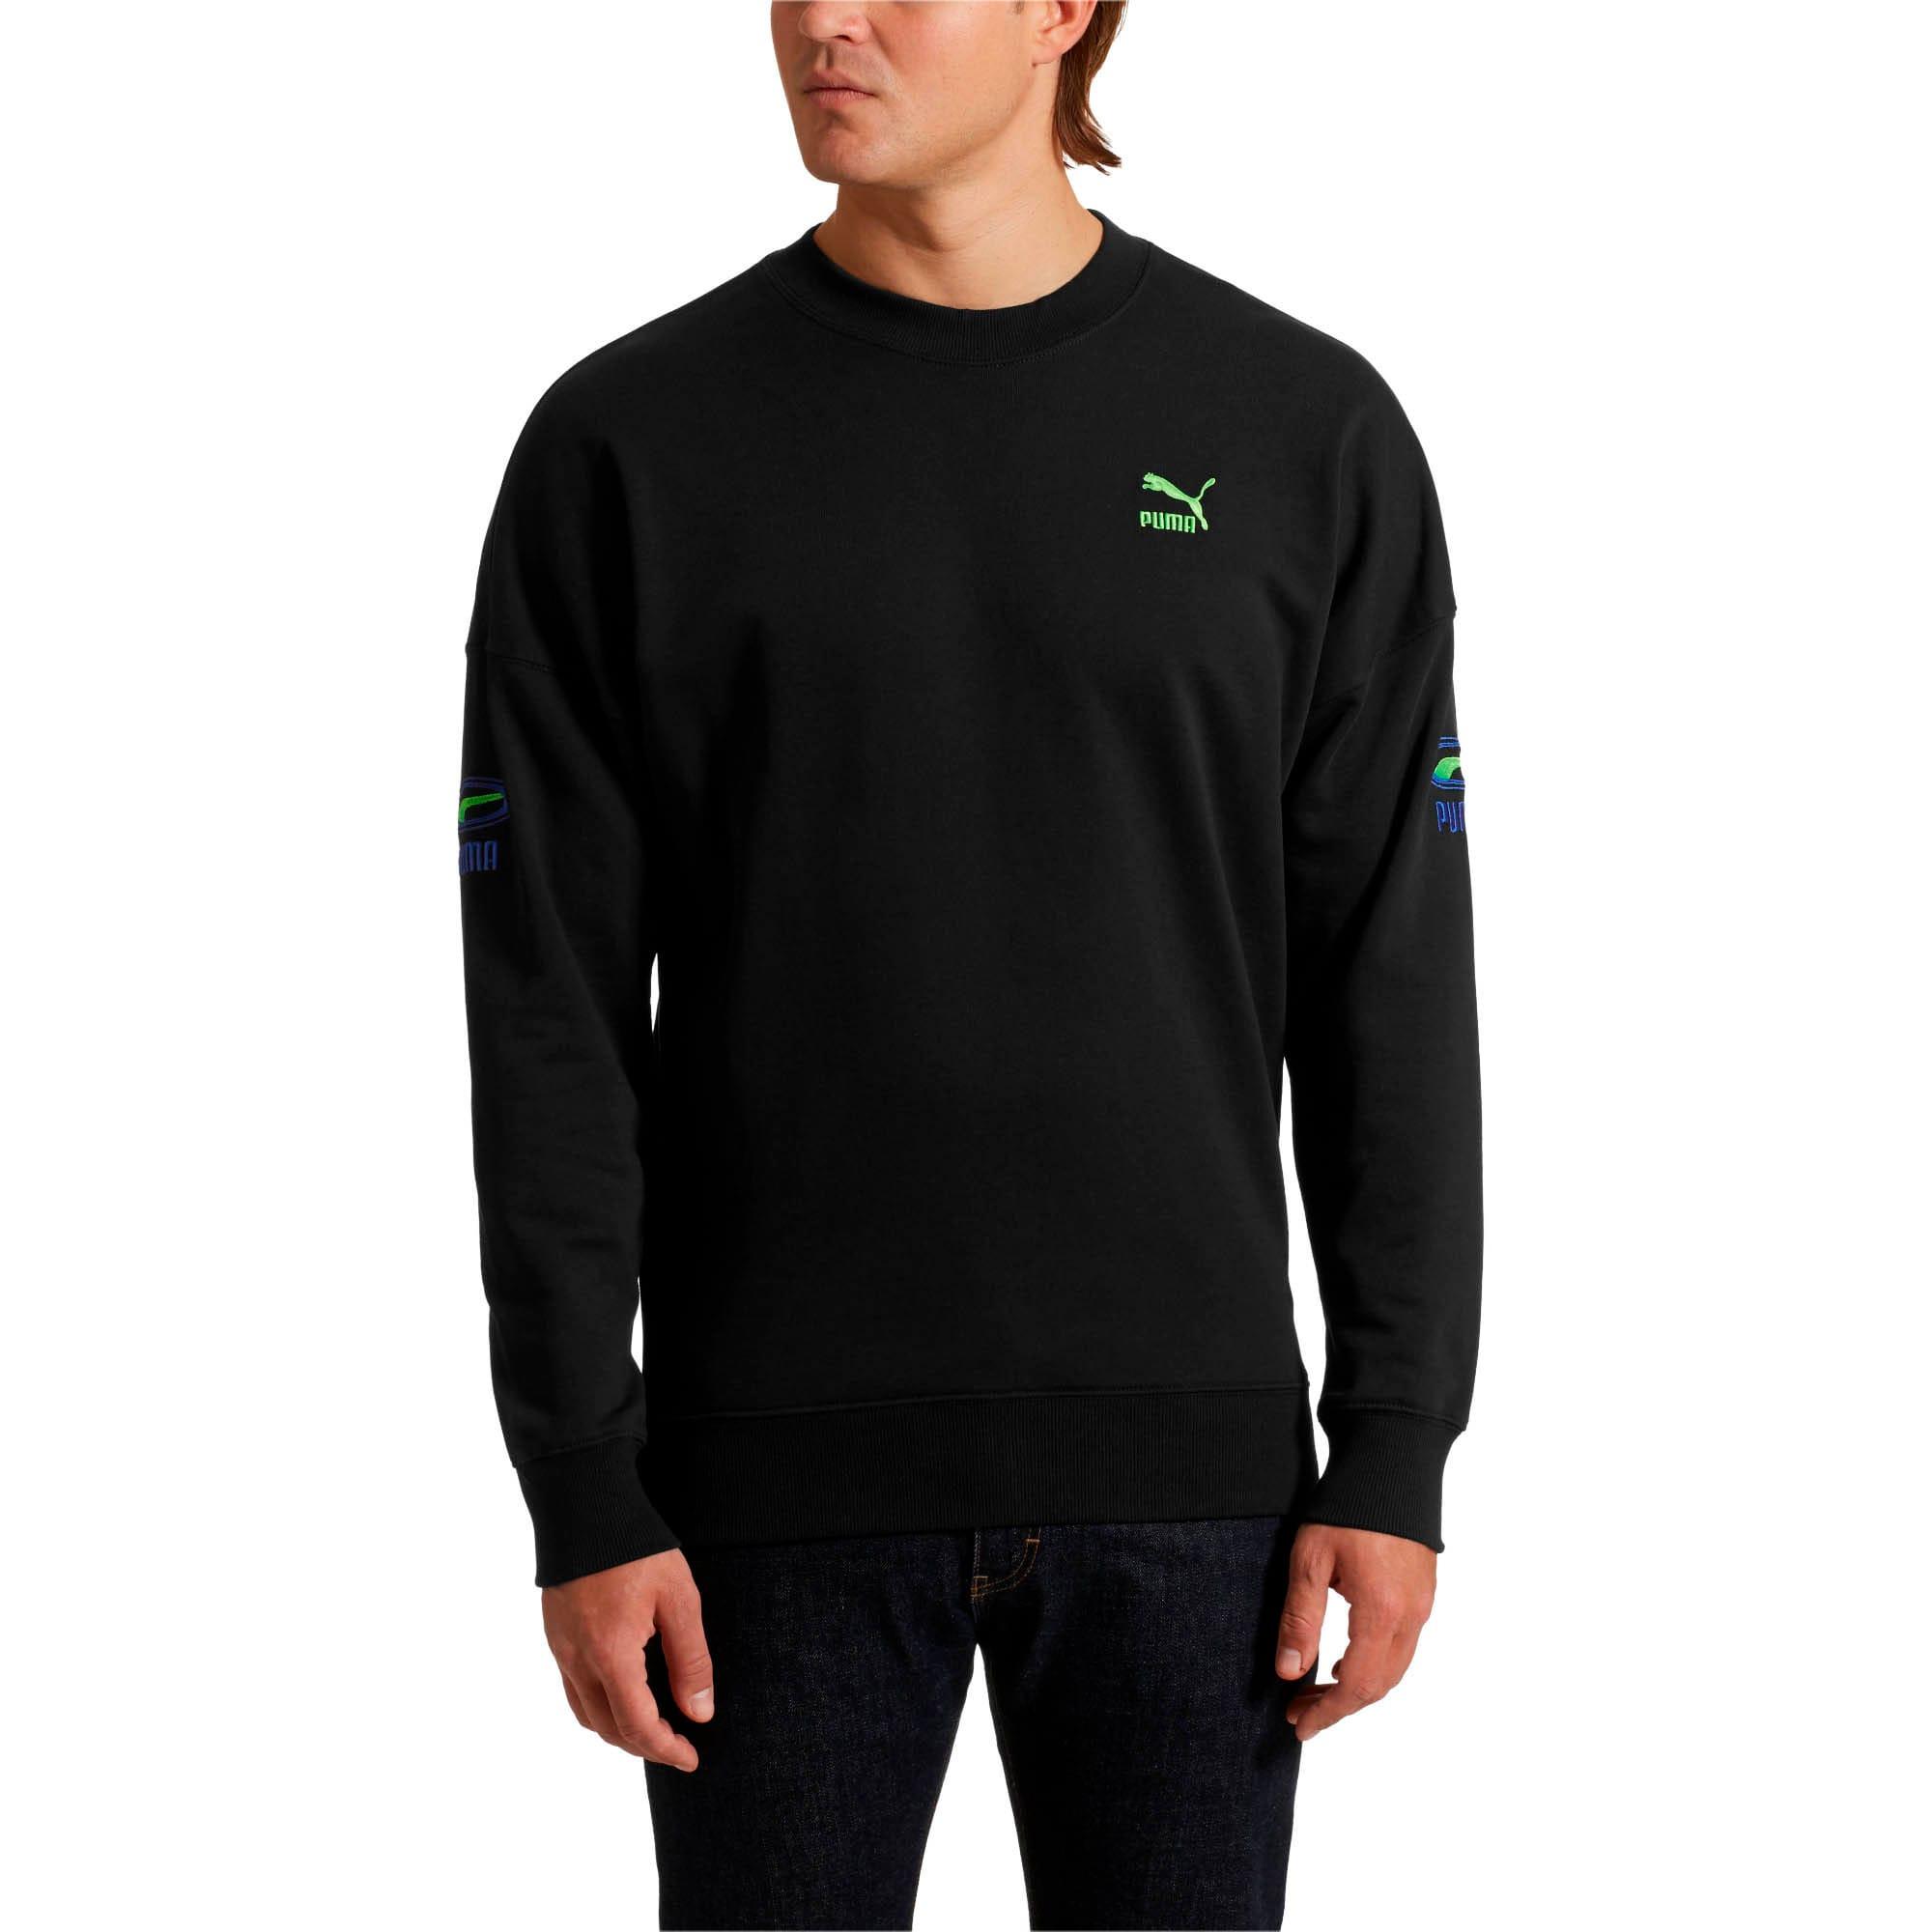 Thumbnail 1 of OG Men's Crewneck Sweatshirt, Puma Black, medium